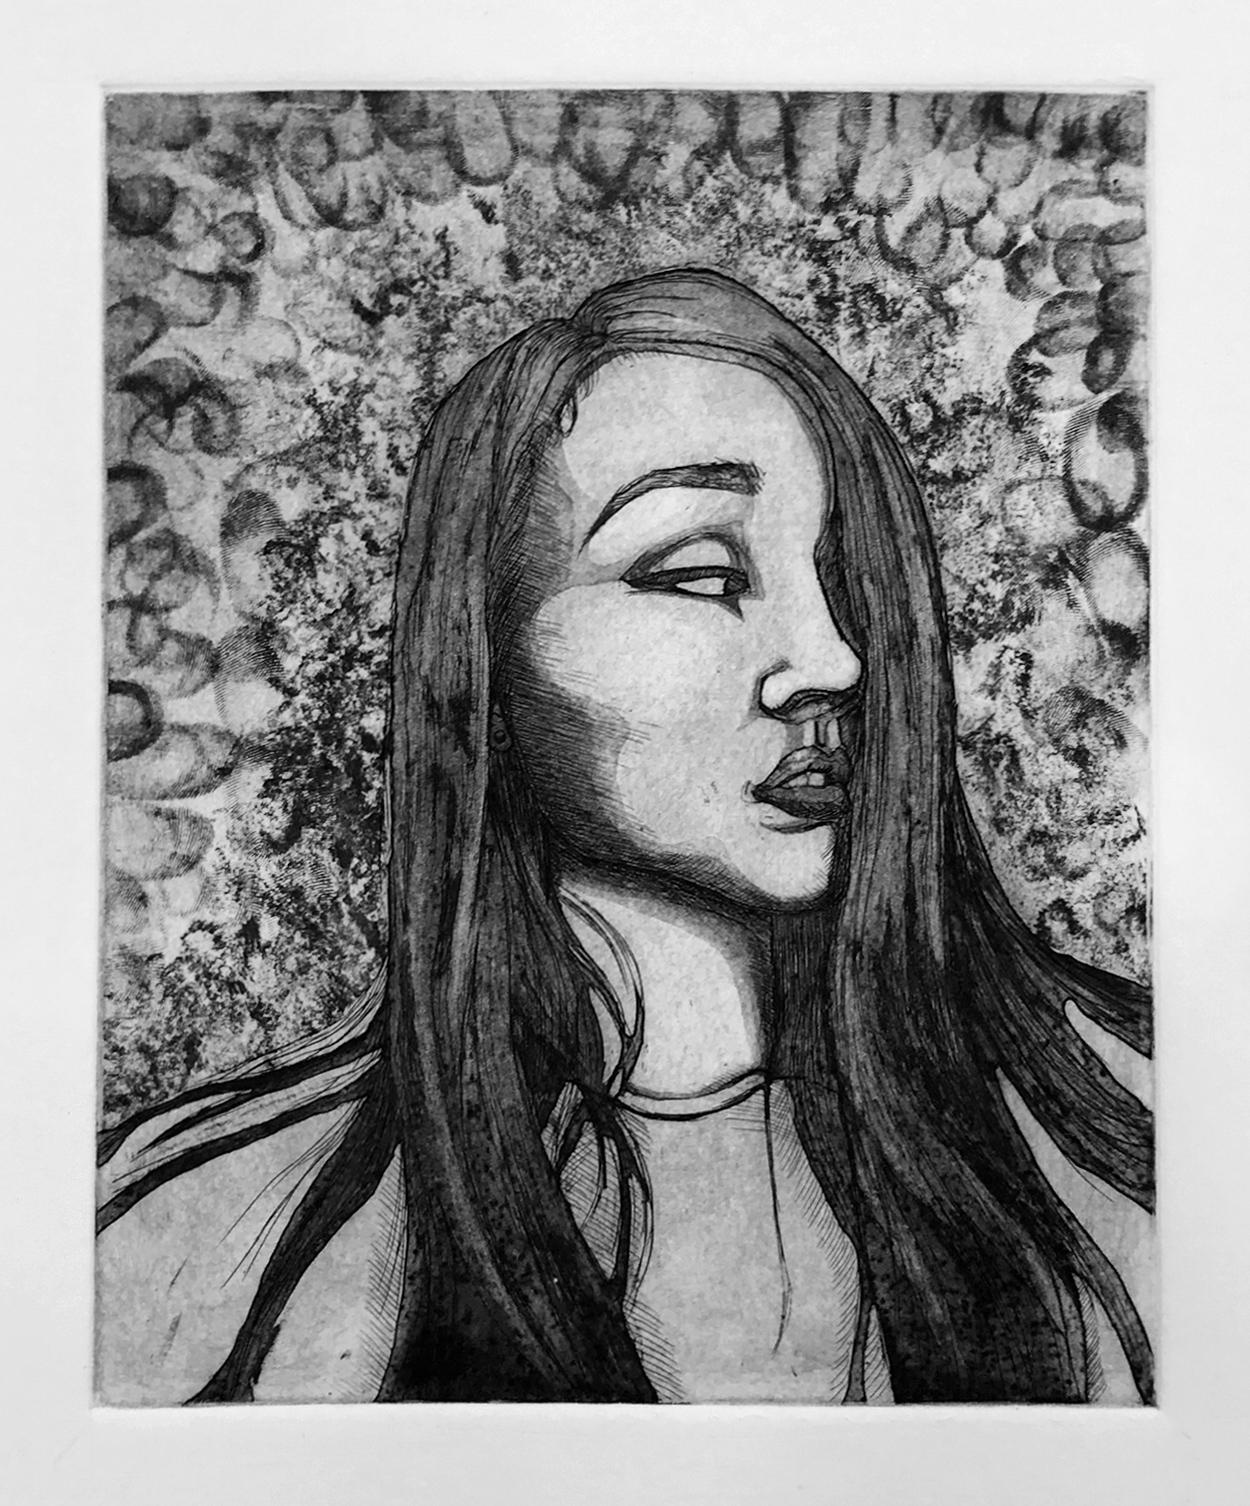 Liqi Sheng, alter ego etching